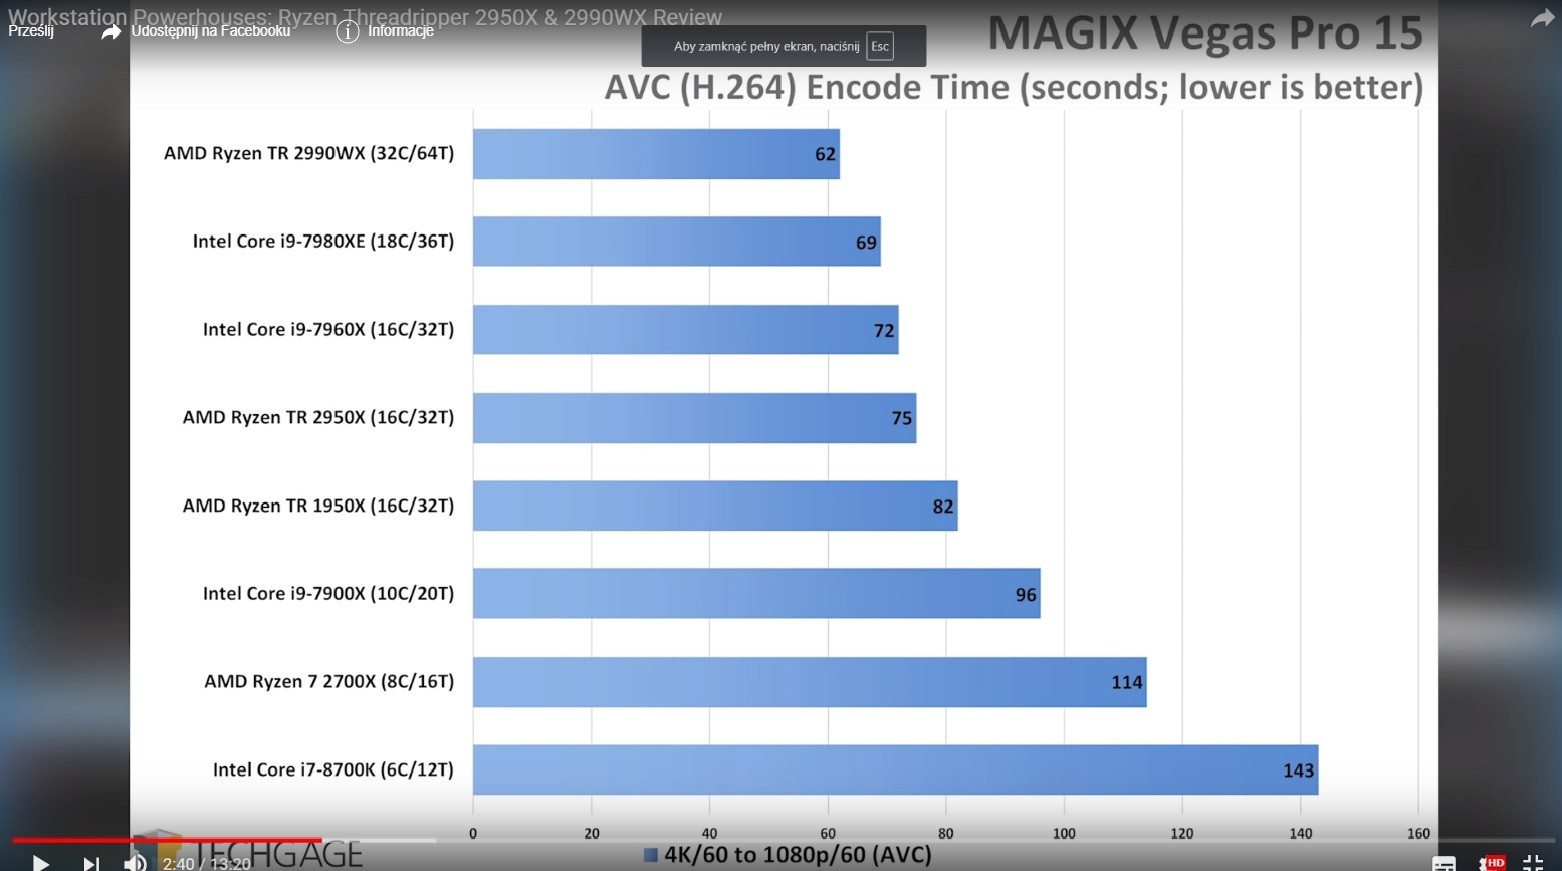 magix vegas pro 14 review